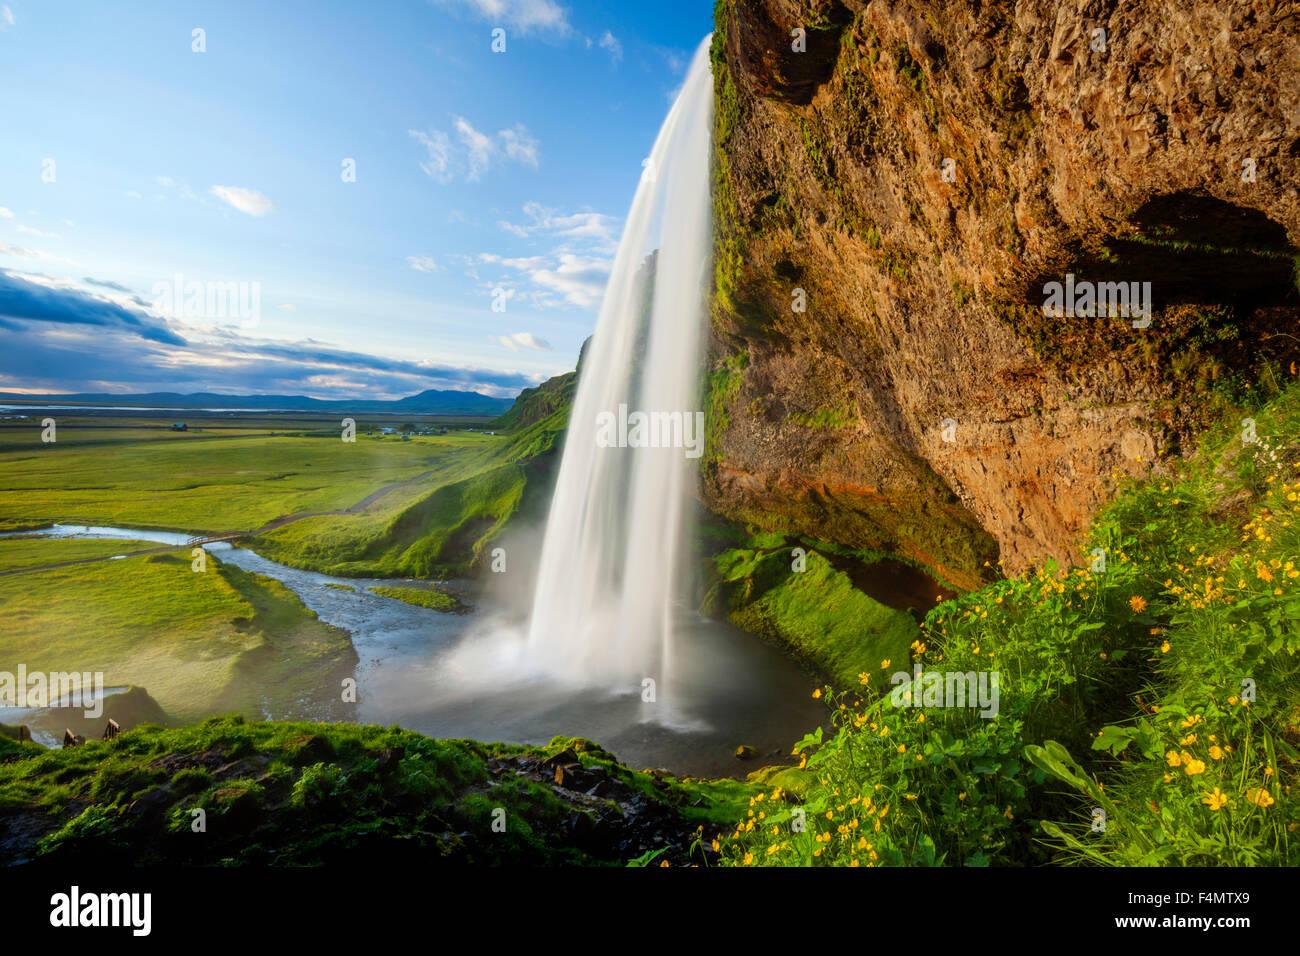 Renoncule à côté de 60m de haut, la cascade de Seljalandsfoss Sudhurland, Islande. Photo Stock